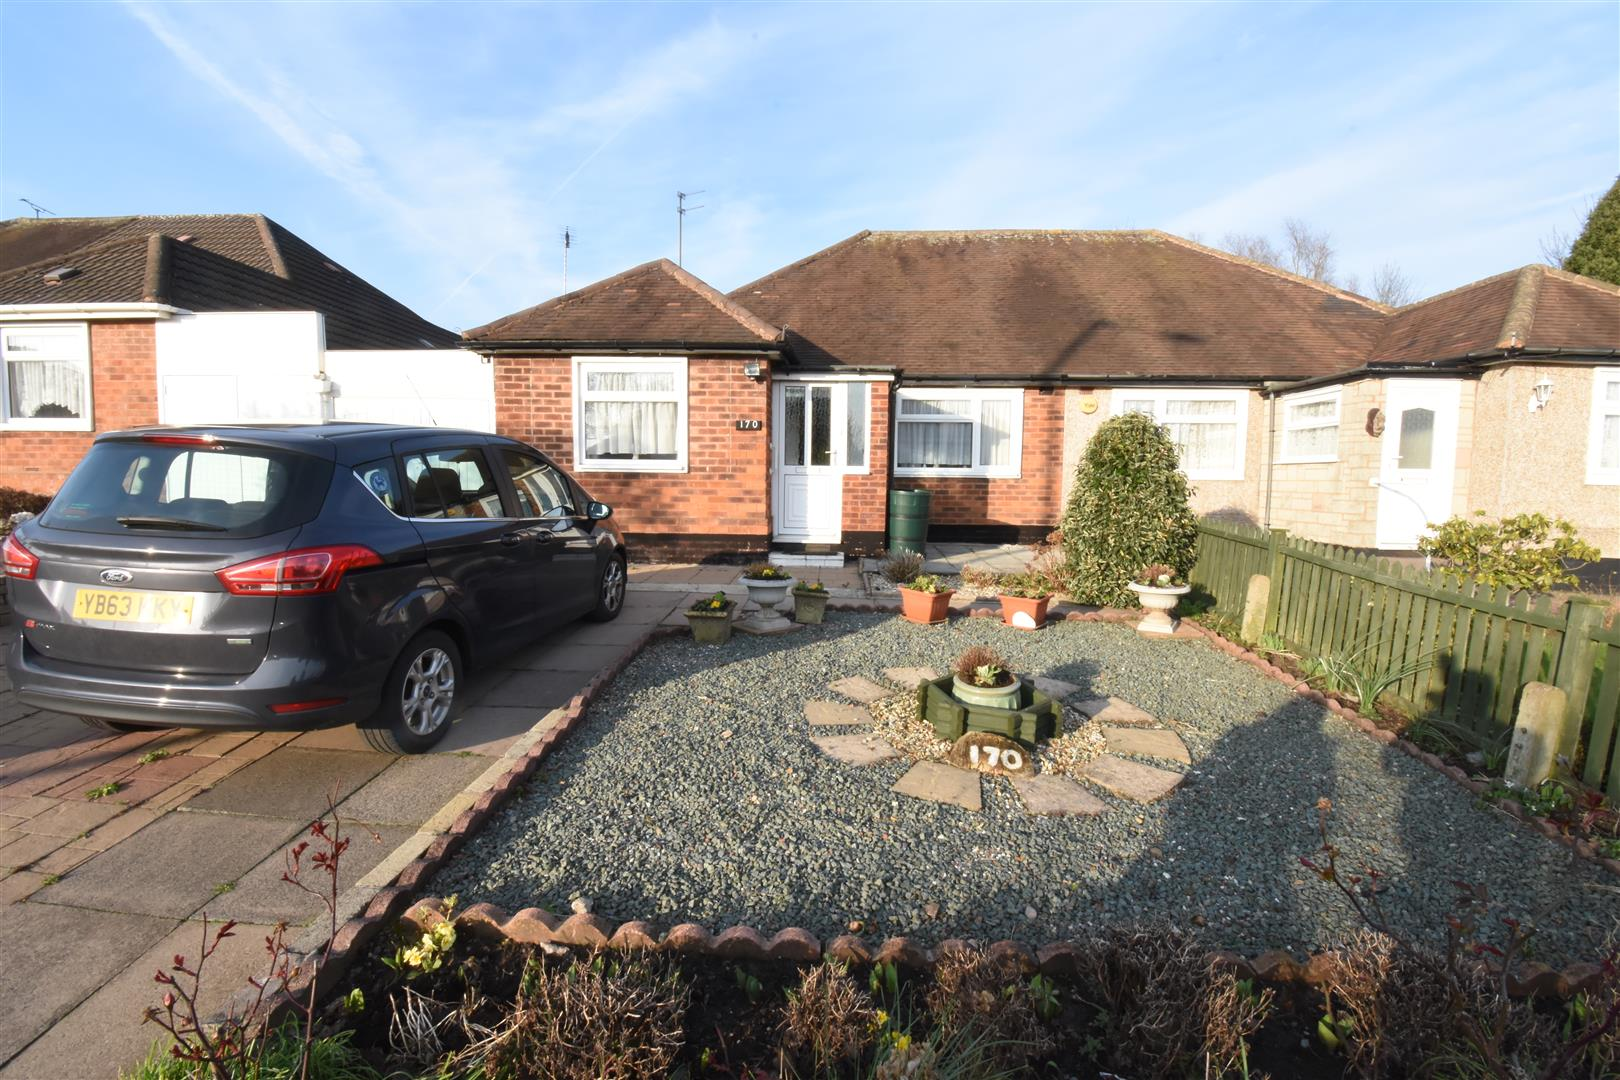 3 bed bungalow for sale in Heath Way, Birmingham - Property Image 1